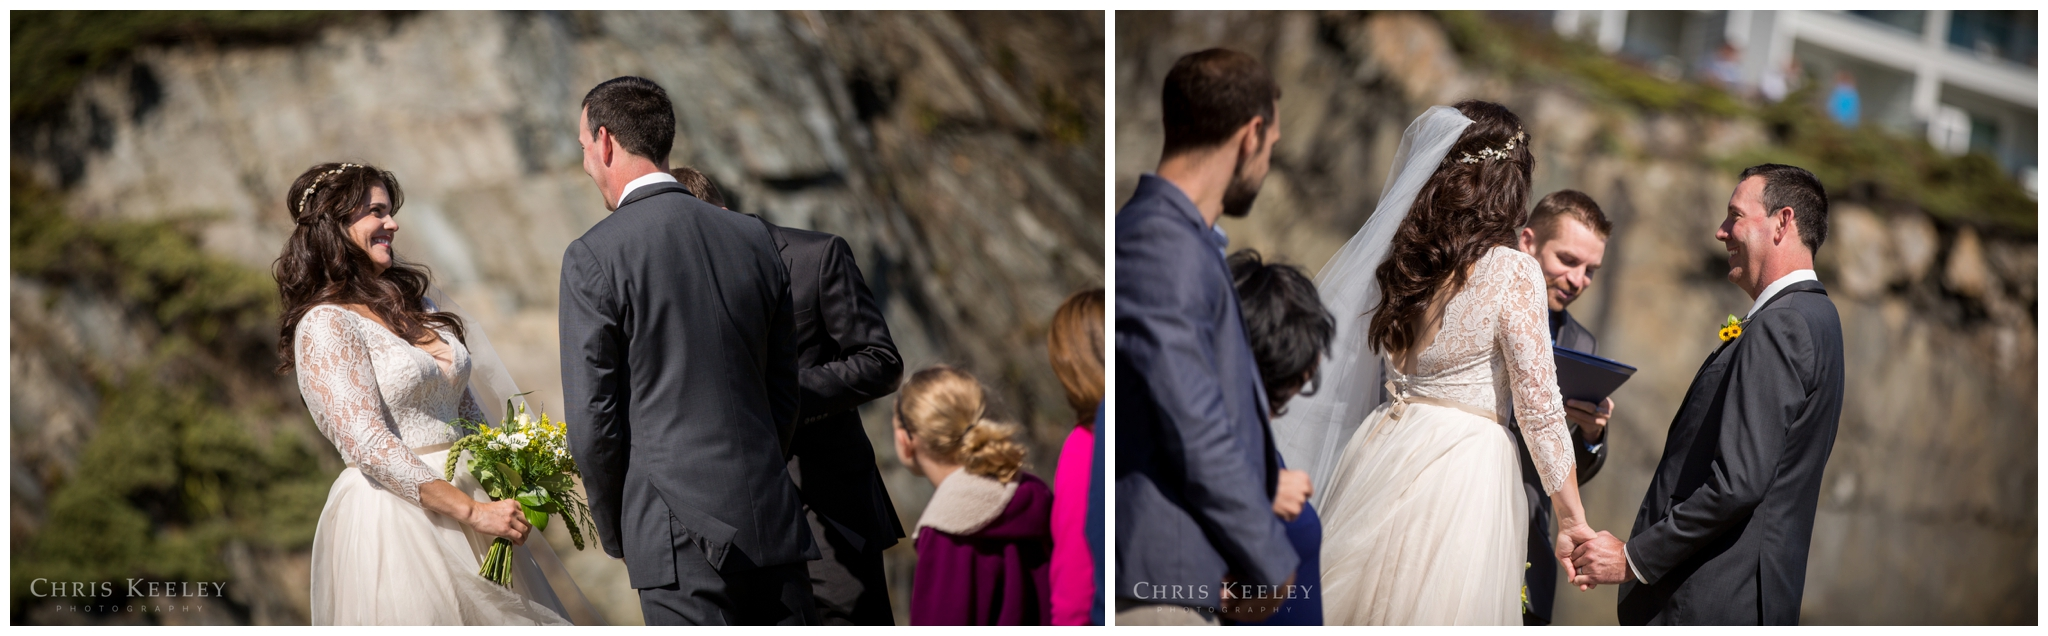 mckenzie-jeff-cliff-house-wedding-new-hampshire-wedding-photographer-chris-keeley-22.jpg